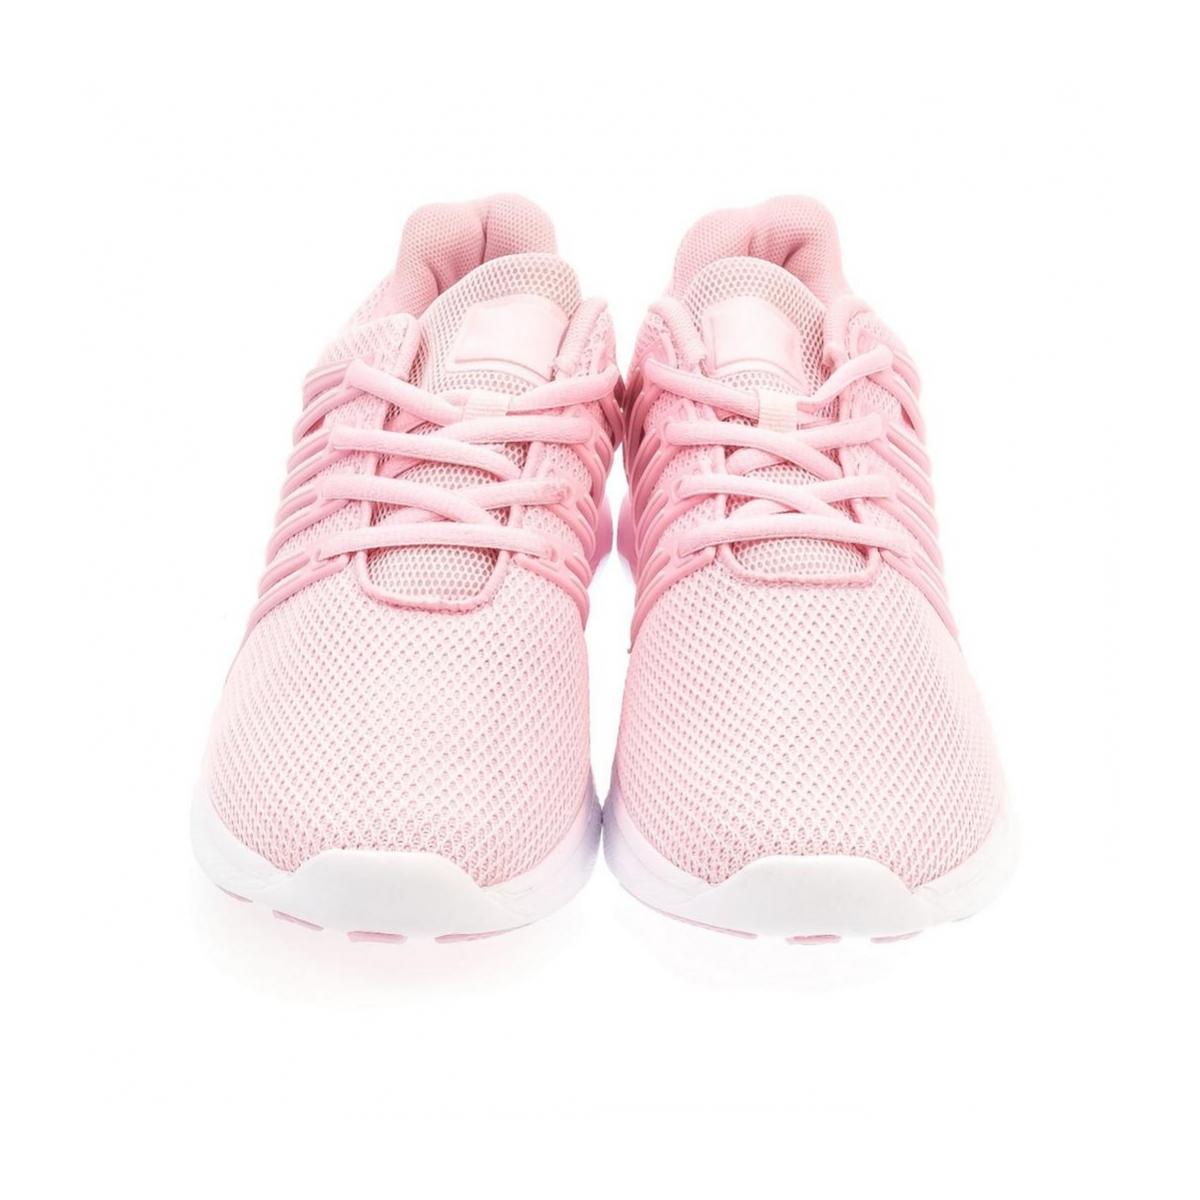 fd04551ddb2f Dámske ružové tenisky DIA - 2